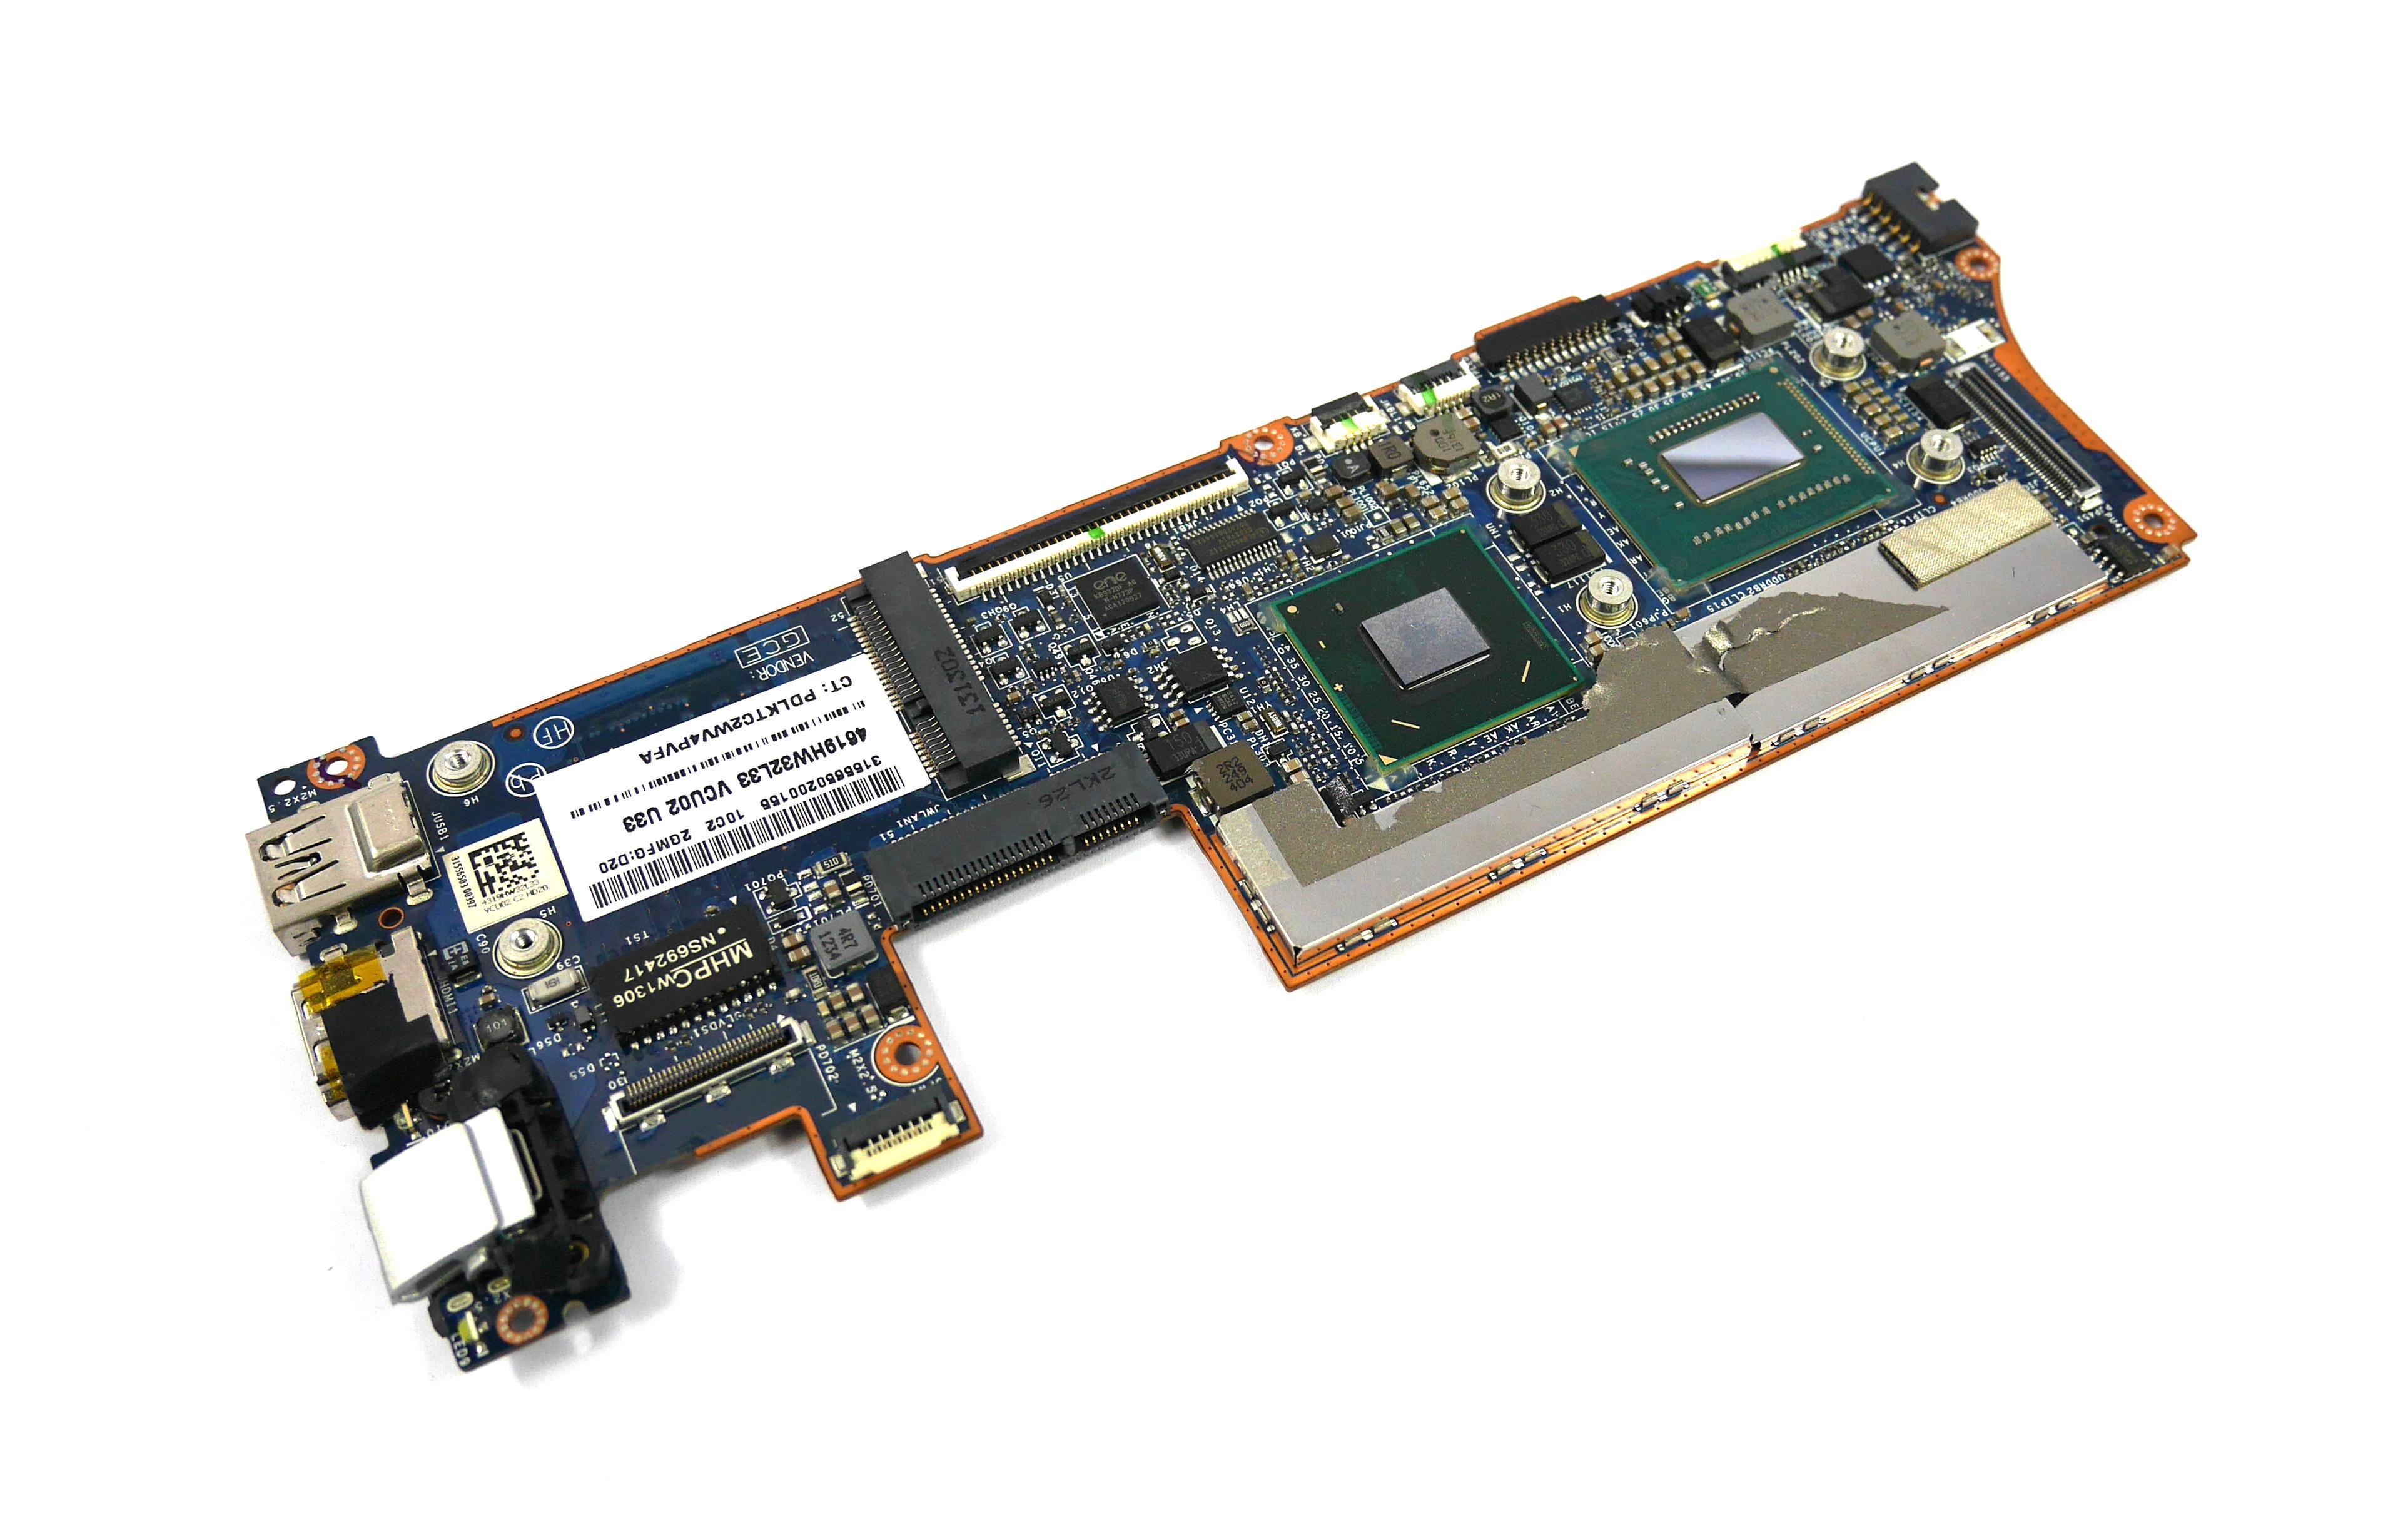 HP 719562-601 Spectre XT Pro 13-B000 Motherboard with Intel i7-3537U Processor